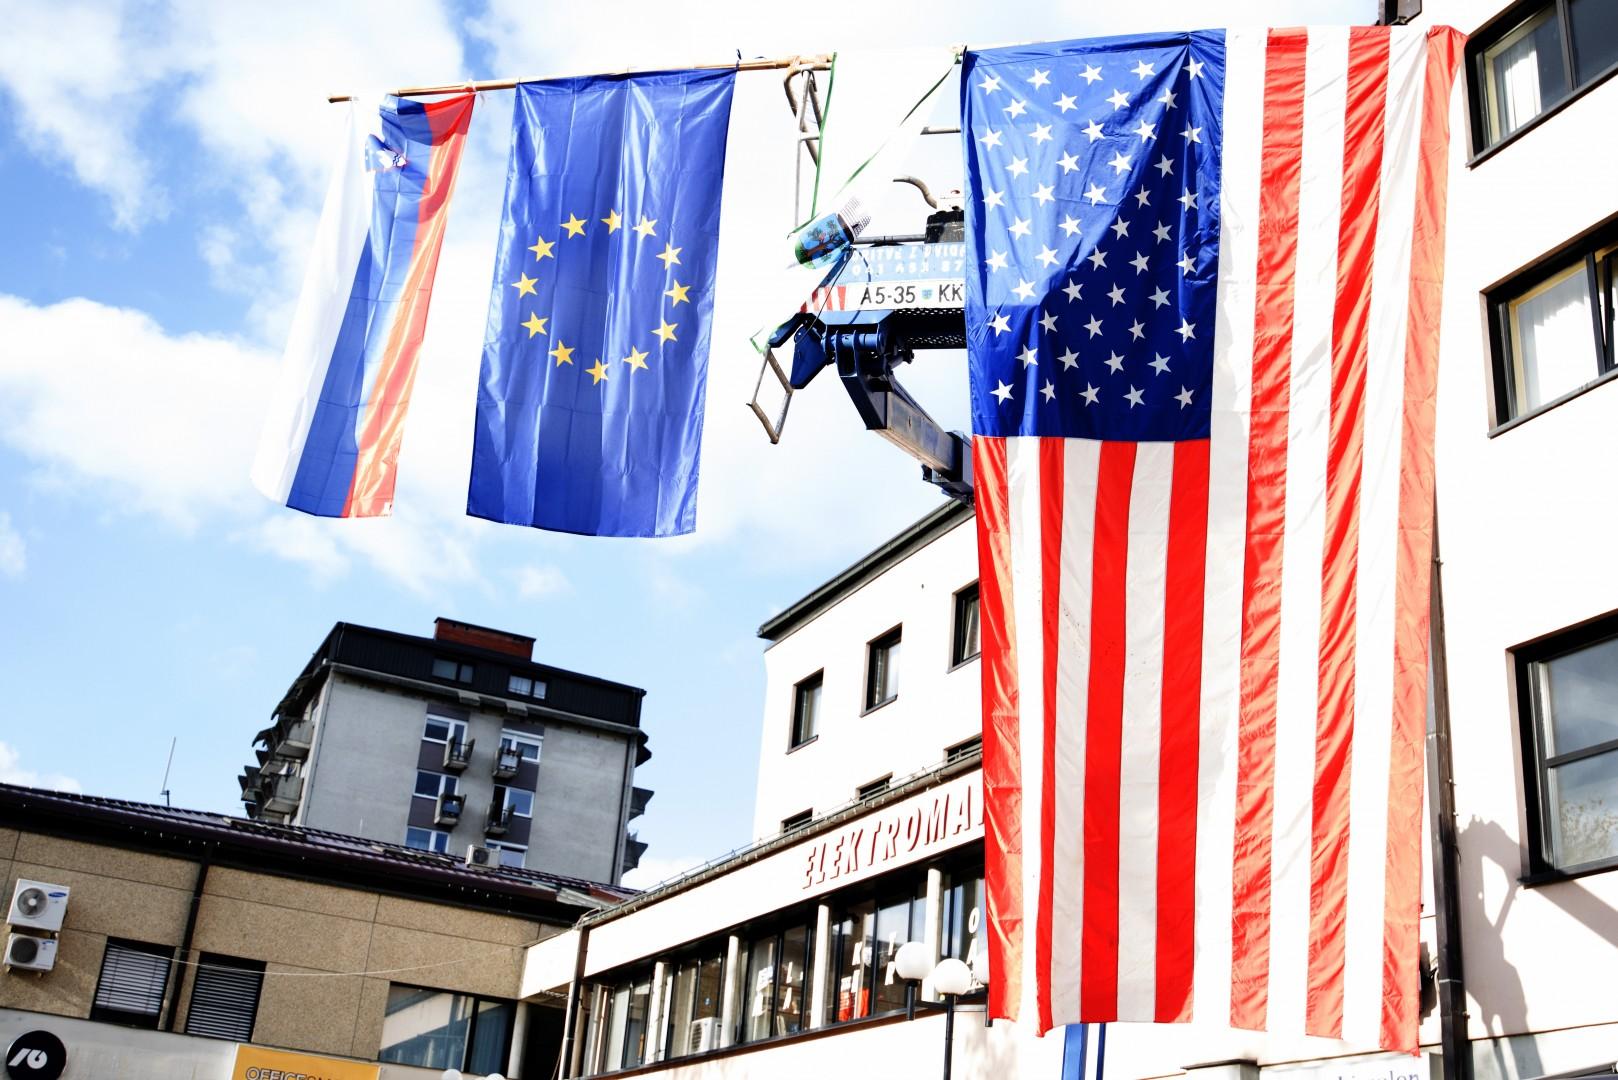 V Sevnici so izobesili kar tri zastave (foto: epa)